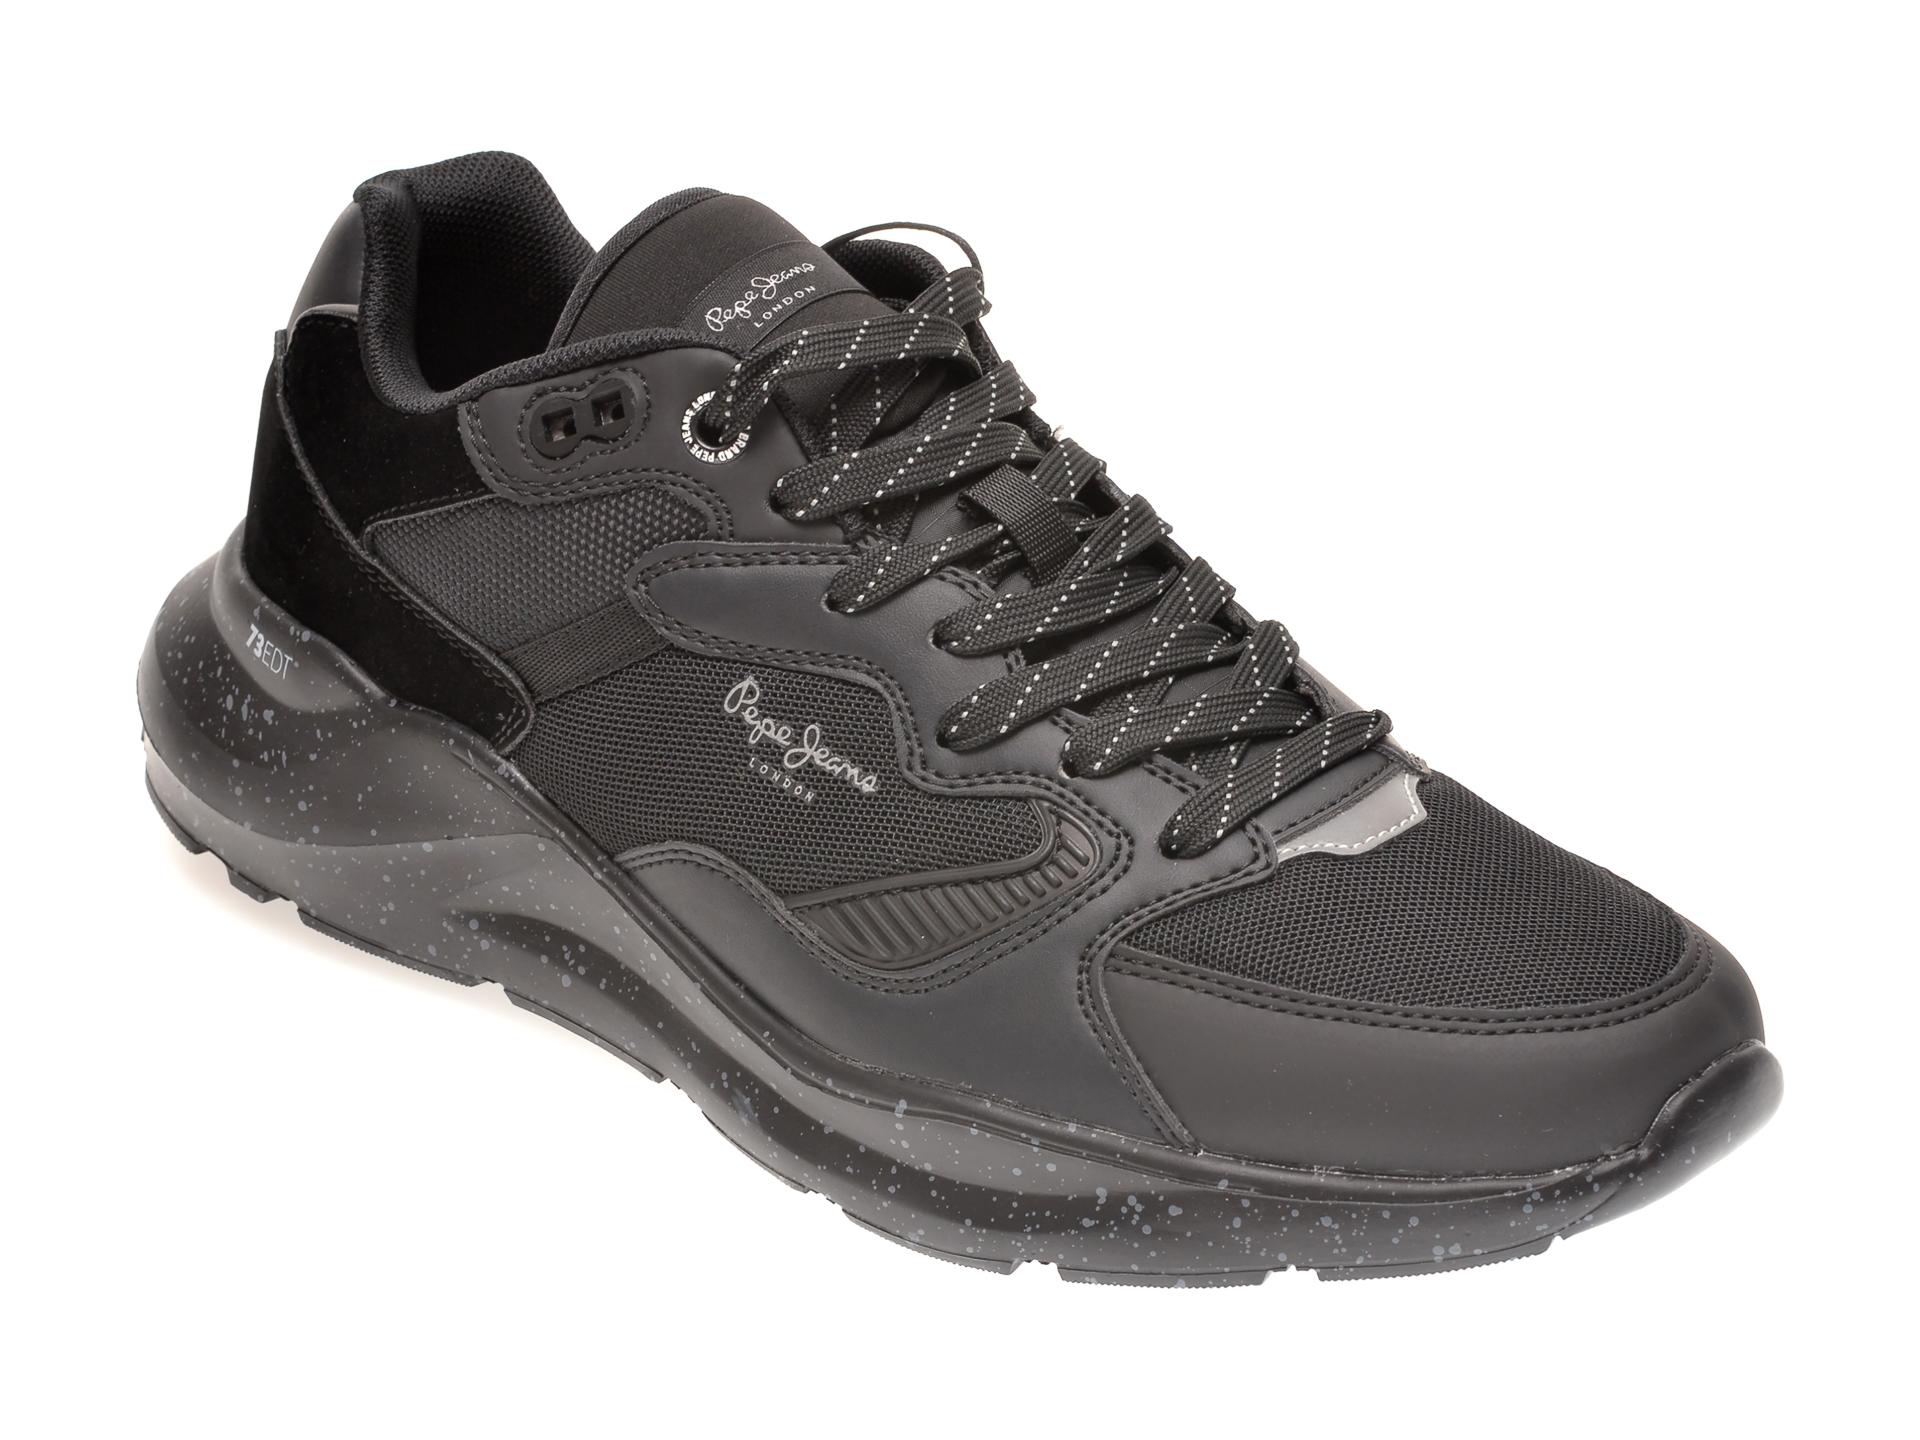 Pantofi sport PEPE JEANS negre, MS30667, din material textil si piele ecologica